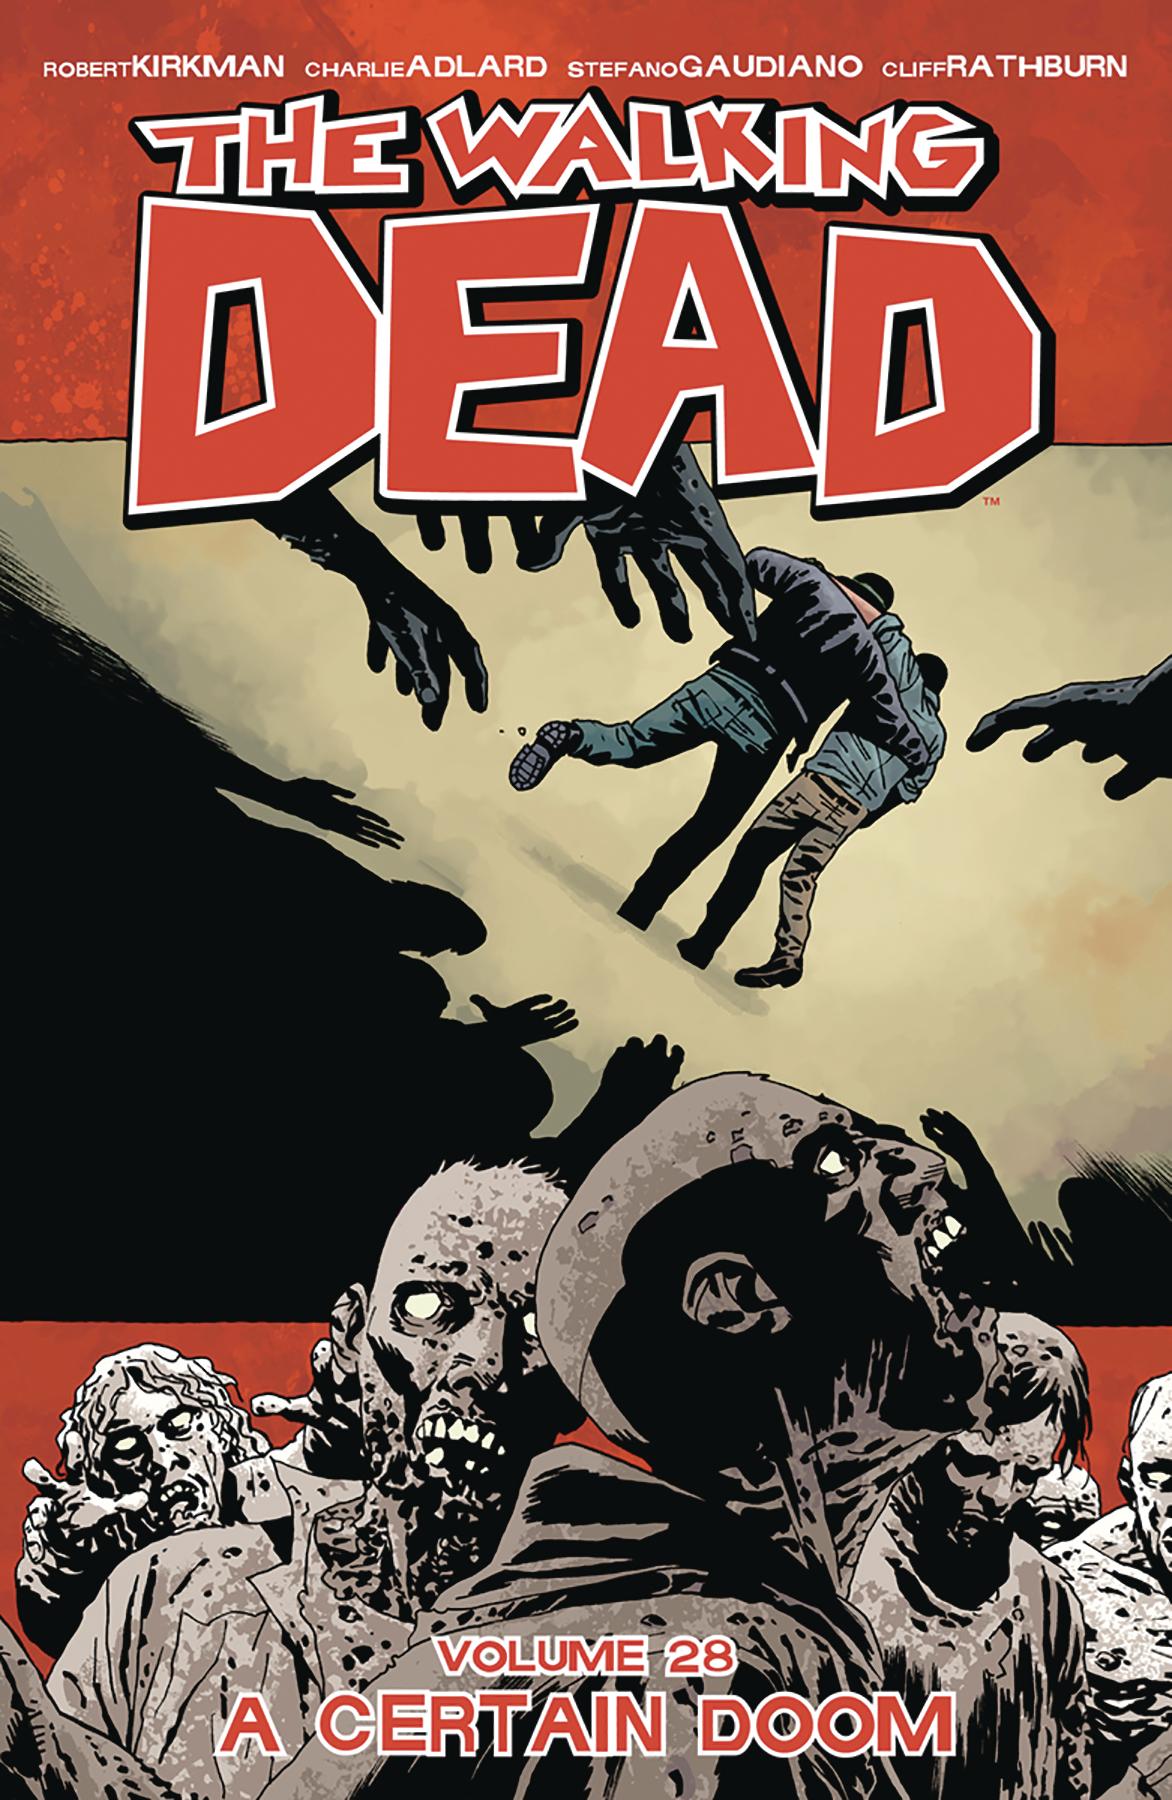 Walking Dead Tp Vol 28 (Mr) (NOV170636)